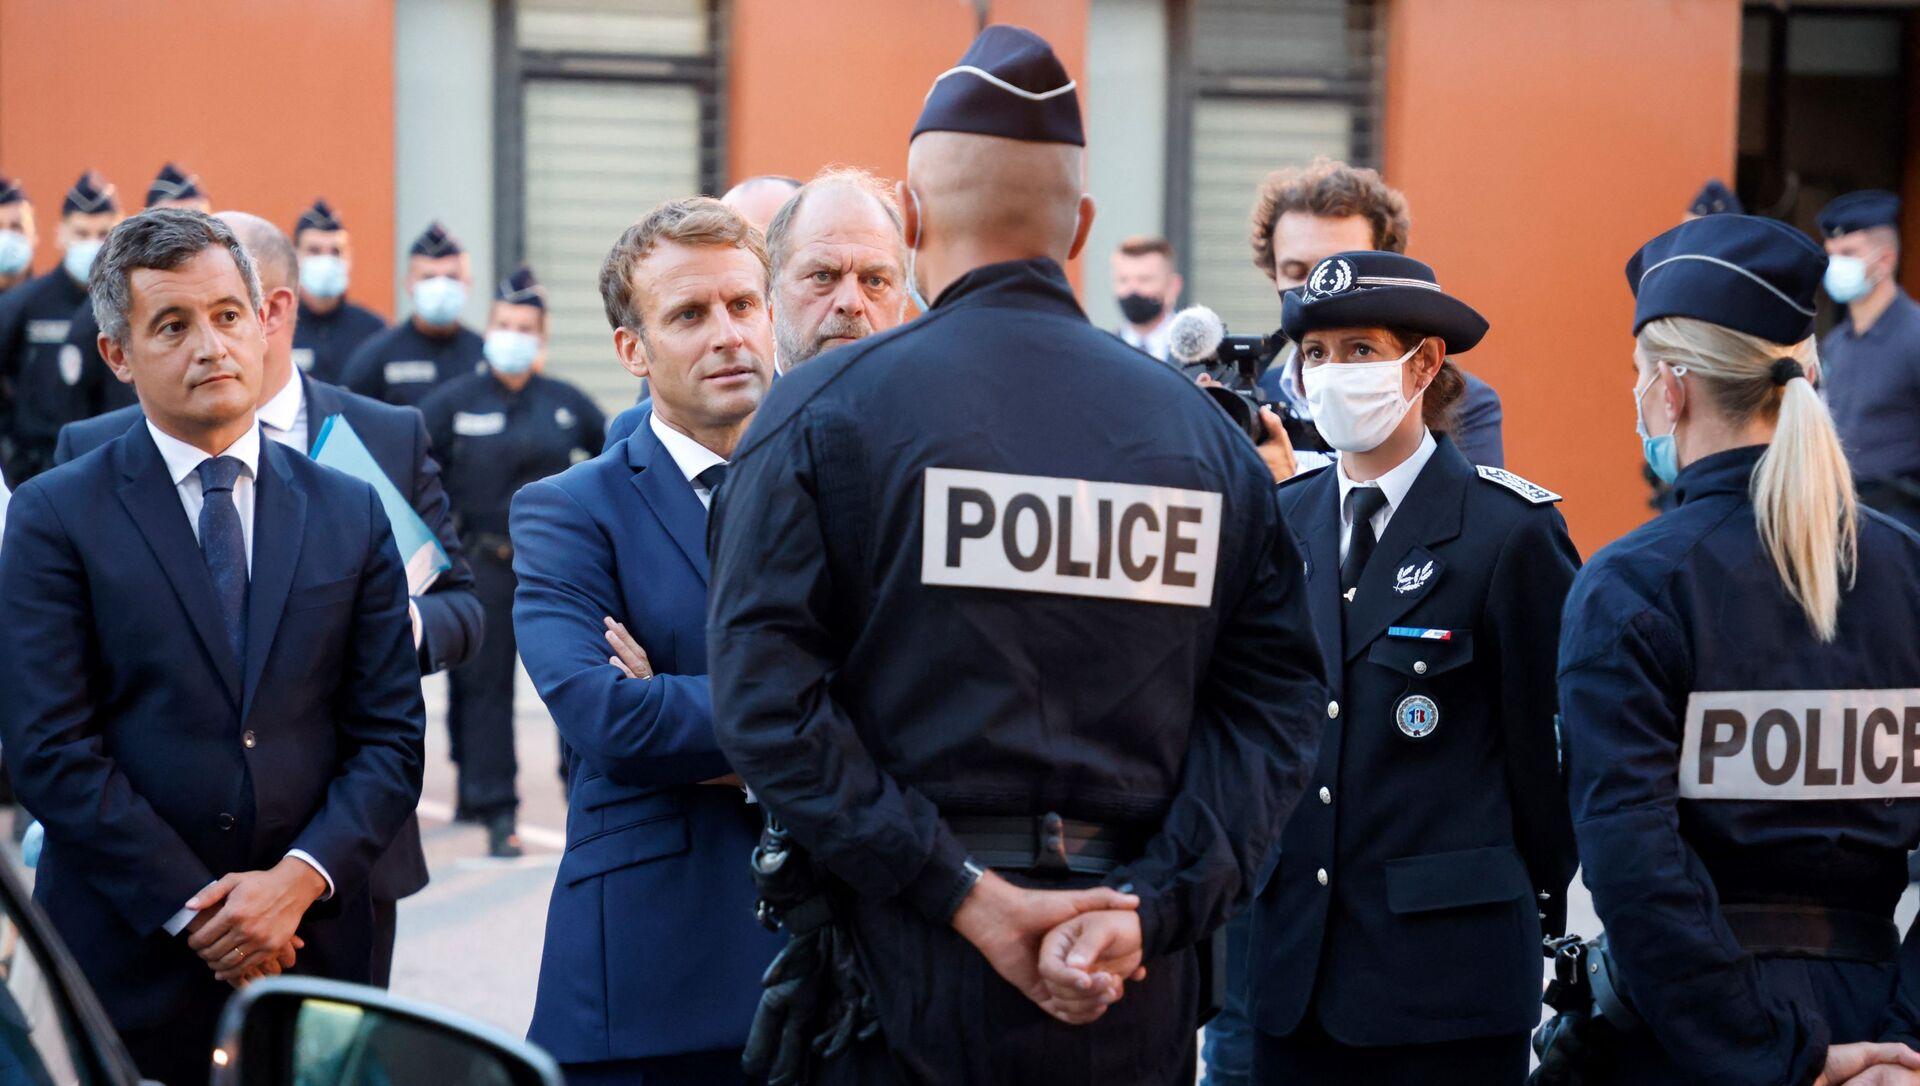 Emmanuel Macron, visite à Marseille - Sputnik France, 1920, 02.09.2021